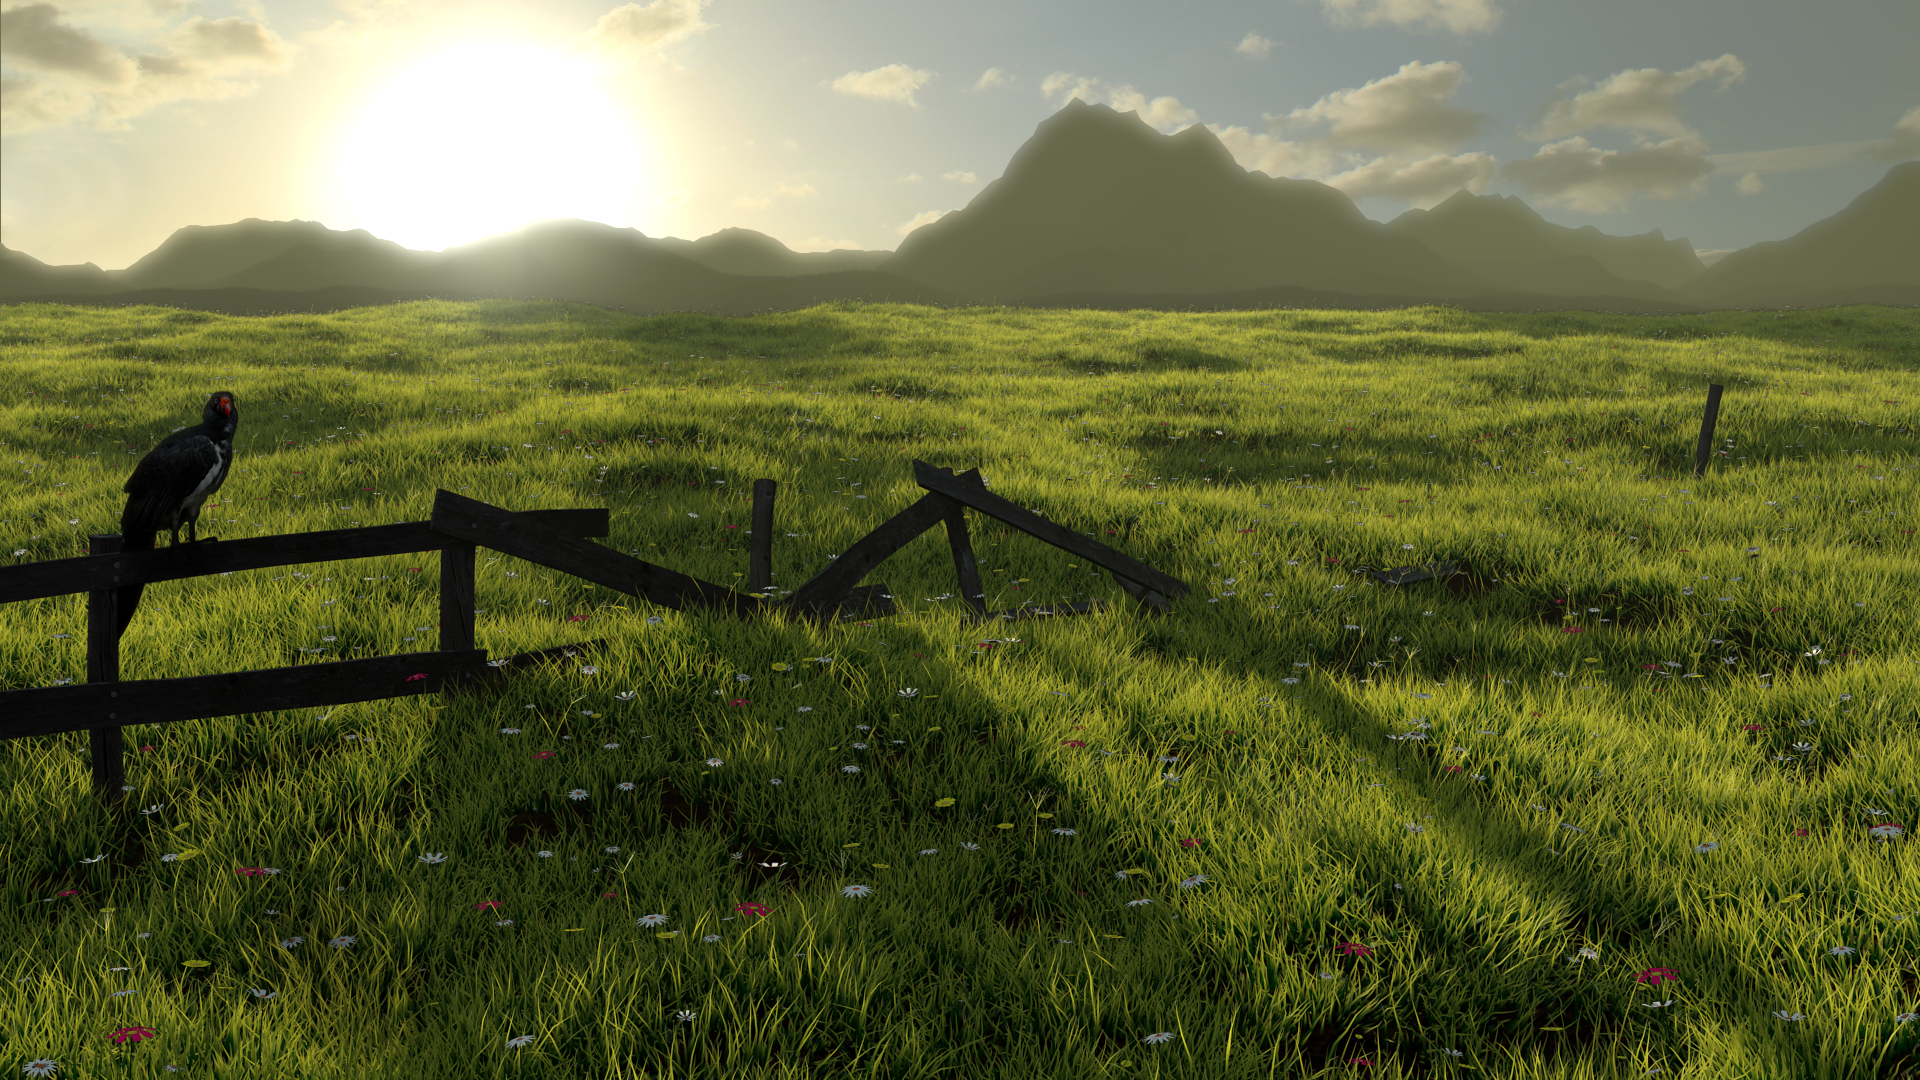 Grassy field by jarwal on deviantart grassy field by jarwal grassy field by jarwal voltagebd Images